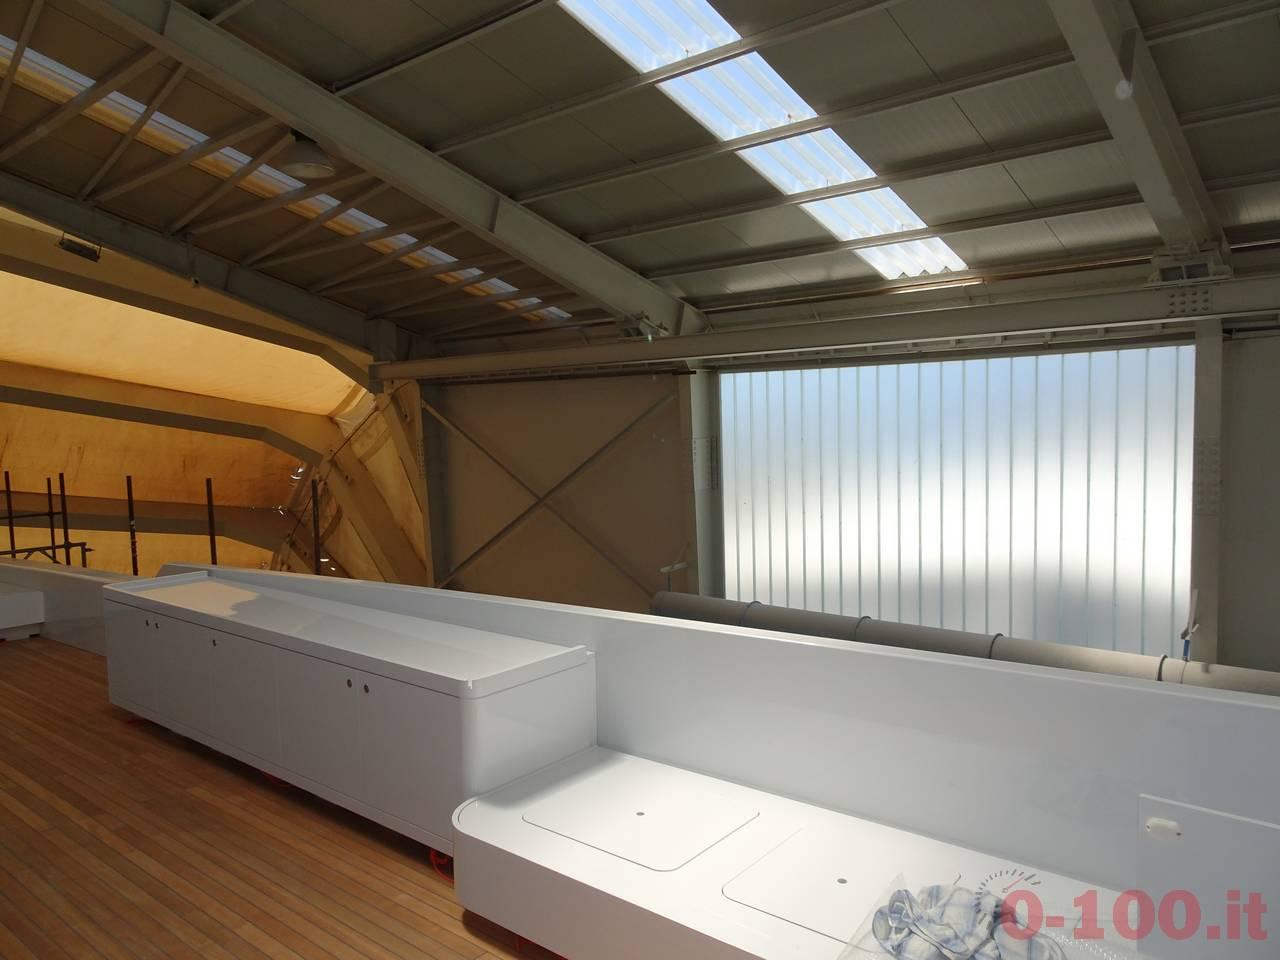 anteprima-mondiale-al-monaco-yacht-show-2016-otam-custom-range-sd35-35mt-my-gipsy-prezzo-price_0-10013